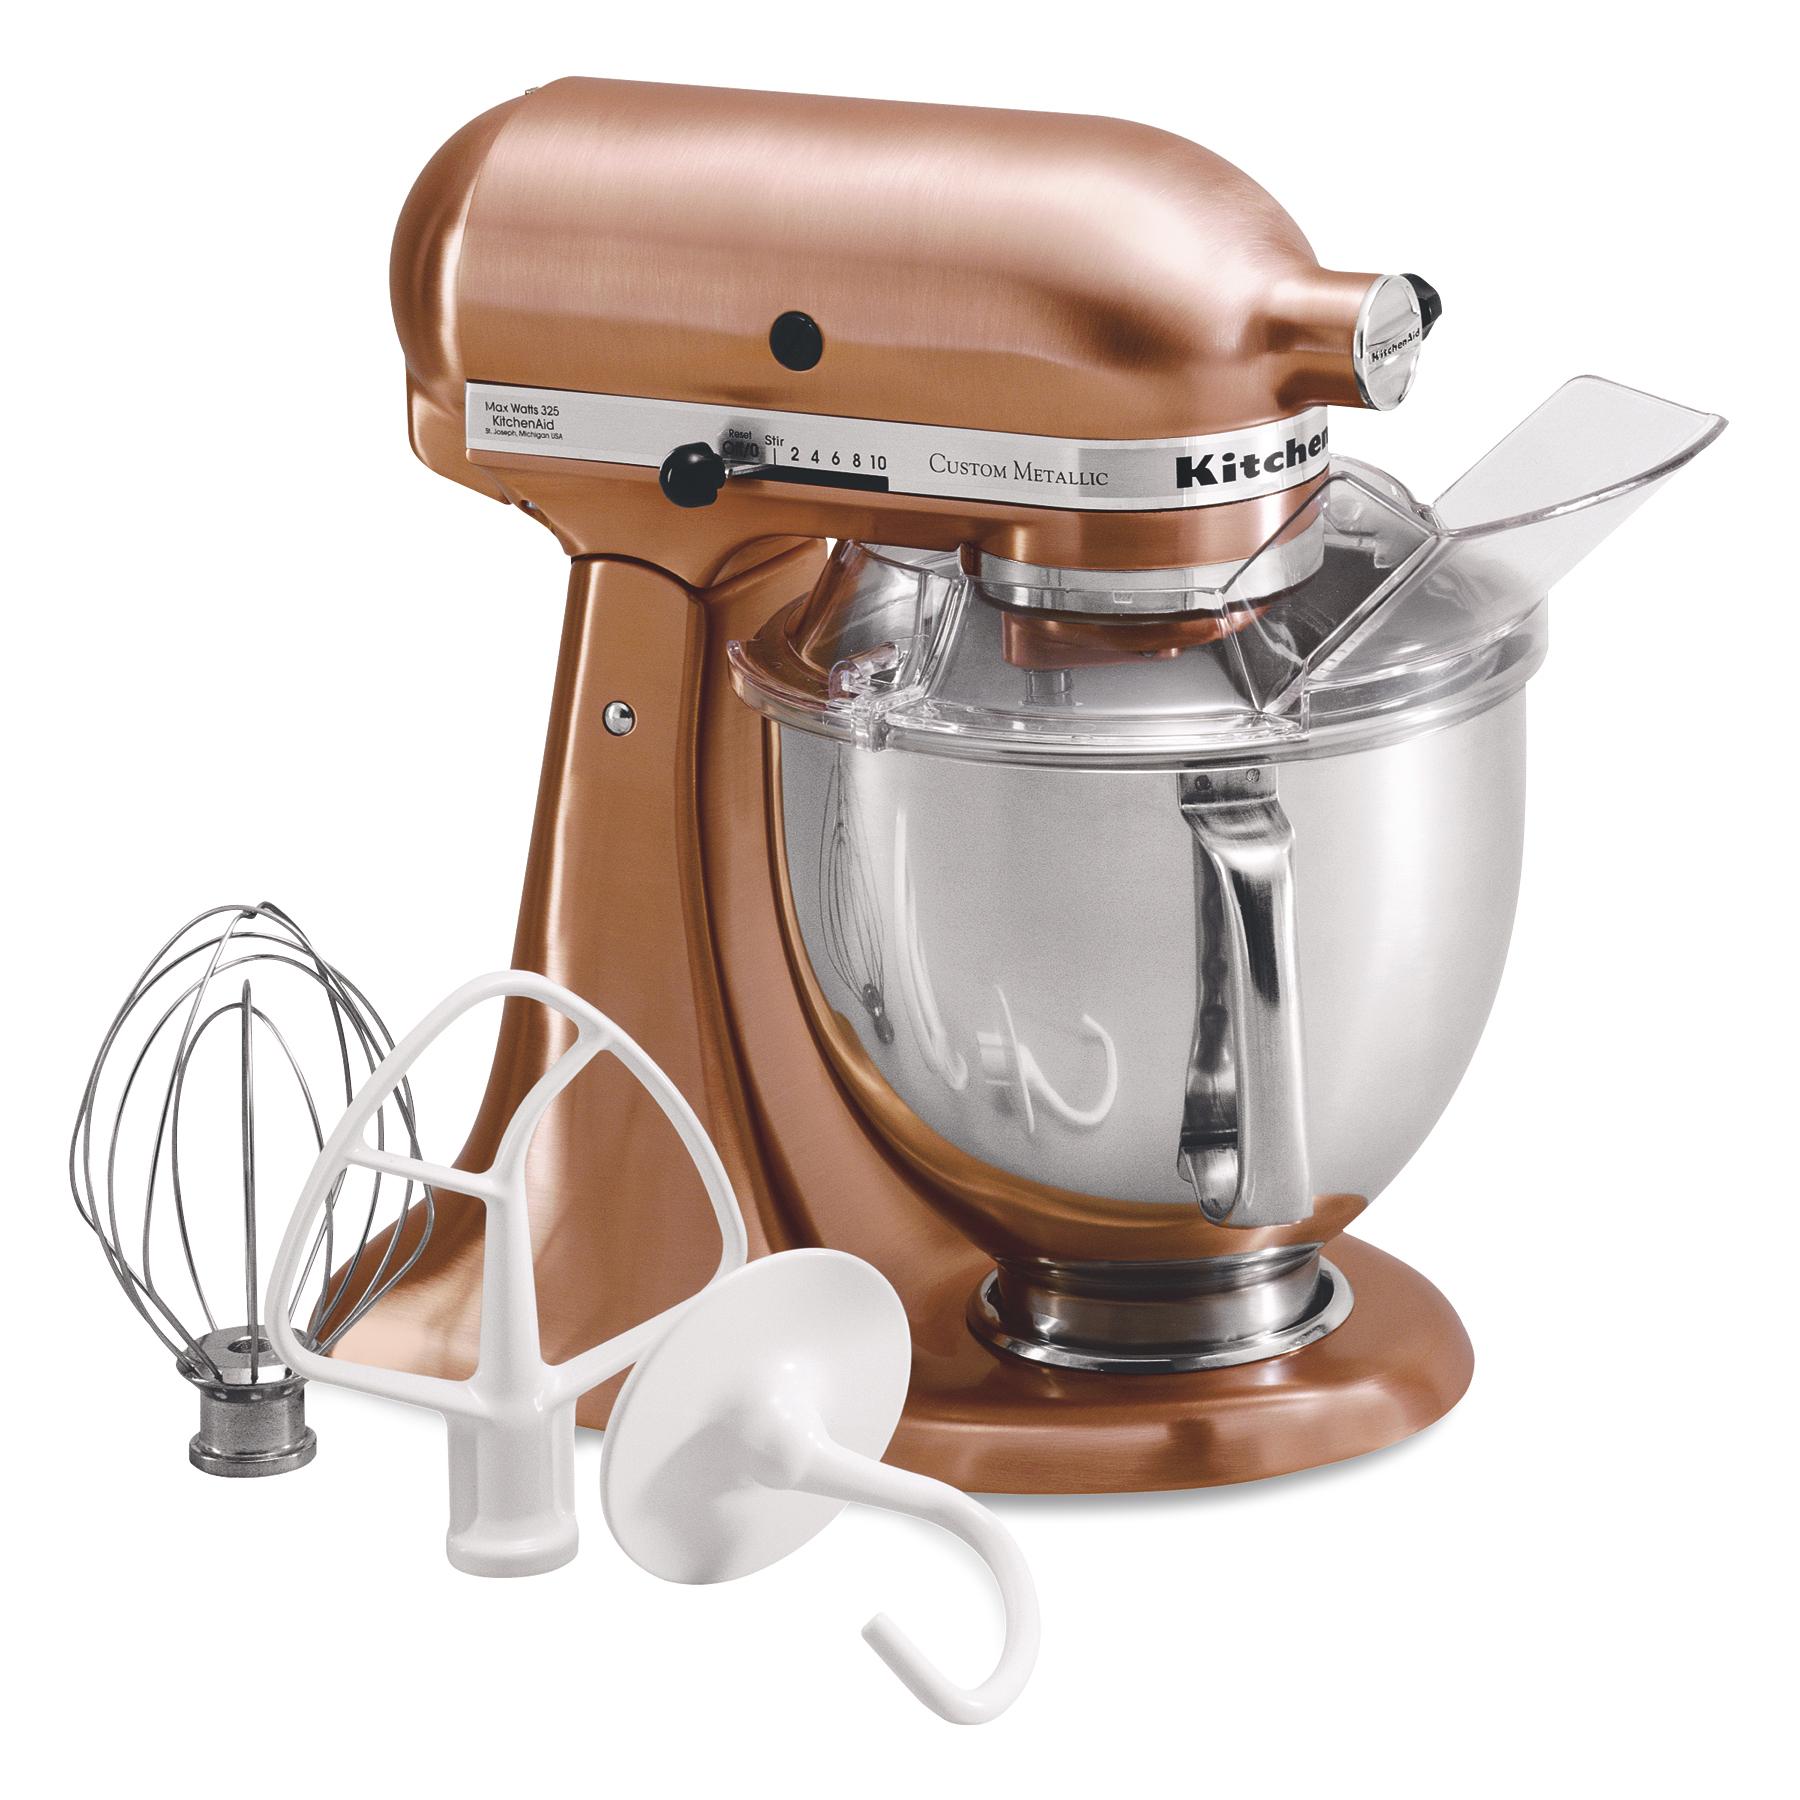 KitchenAid Metallic Series Satin Copper 5 Quart Tilt Head Stand Mixer with Stainless Steel Bowl